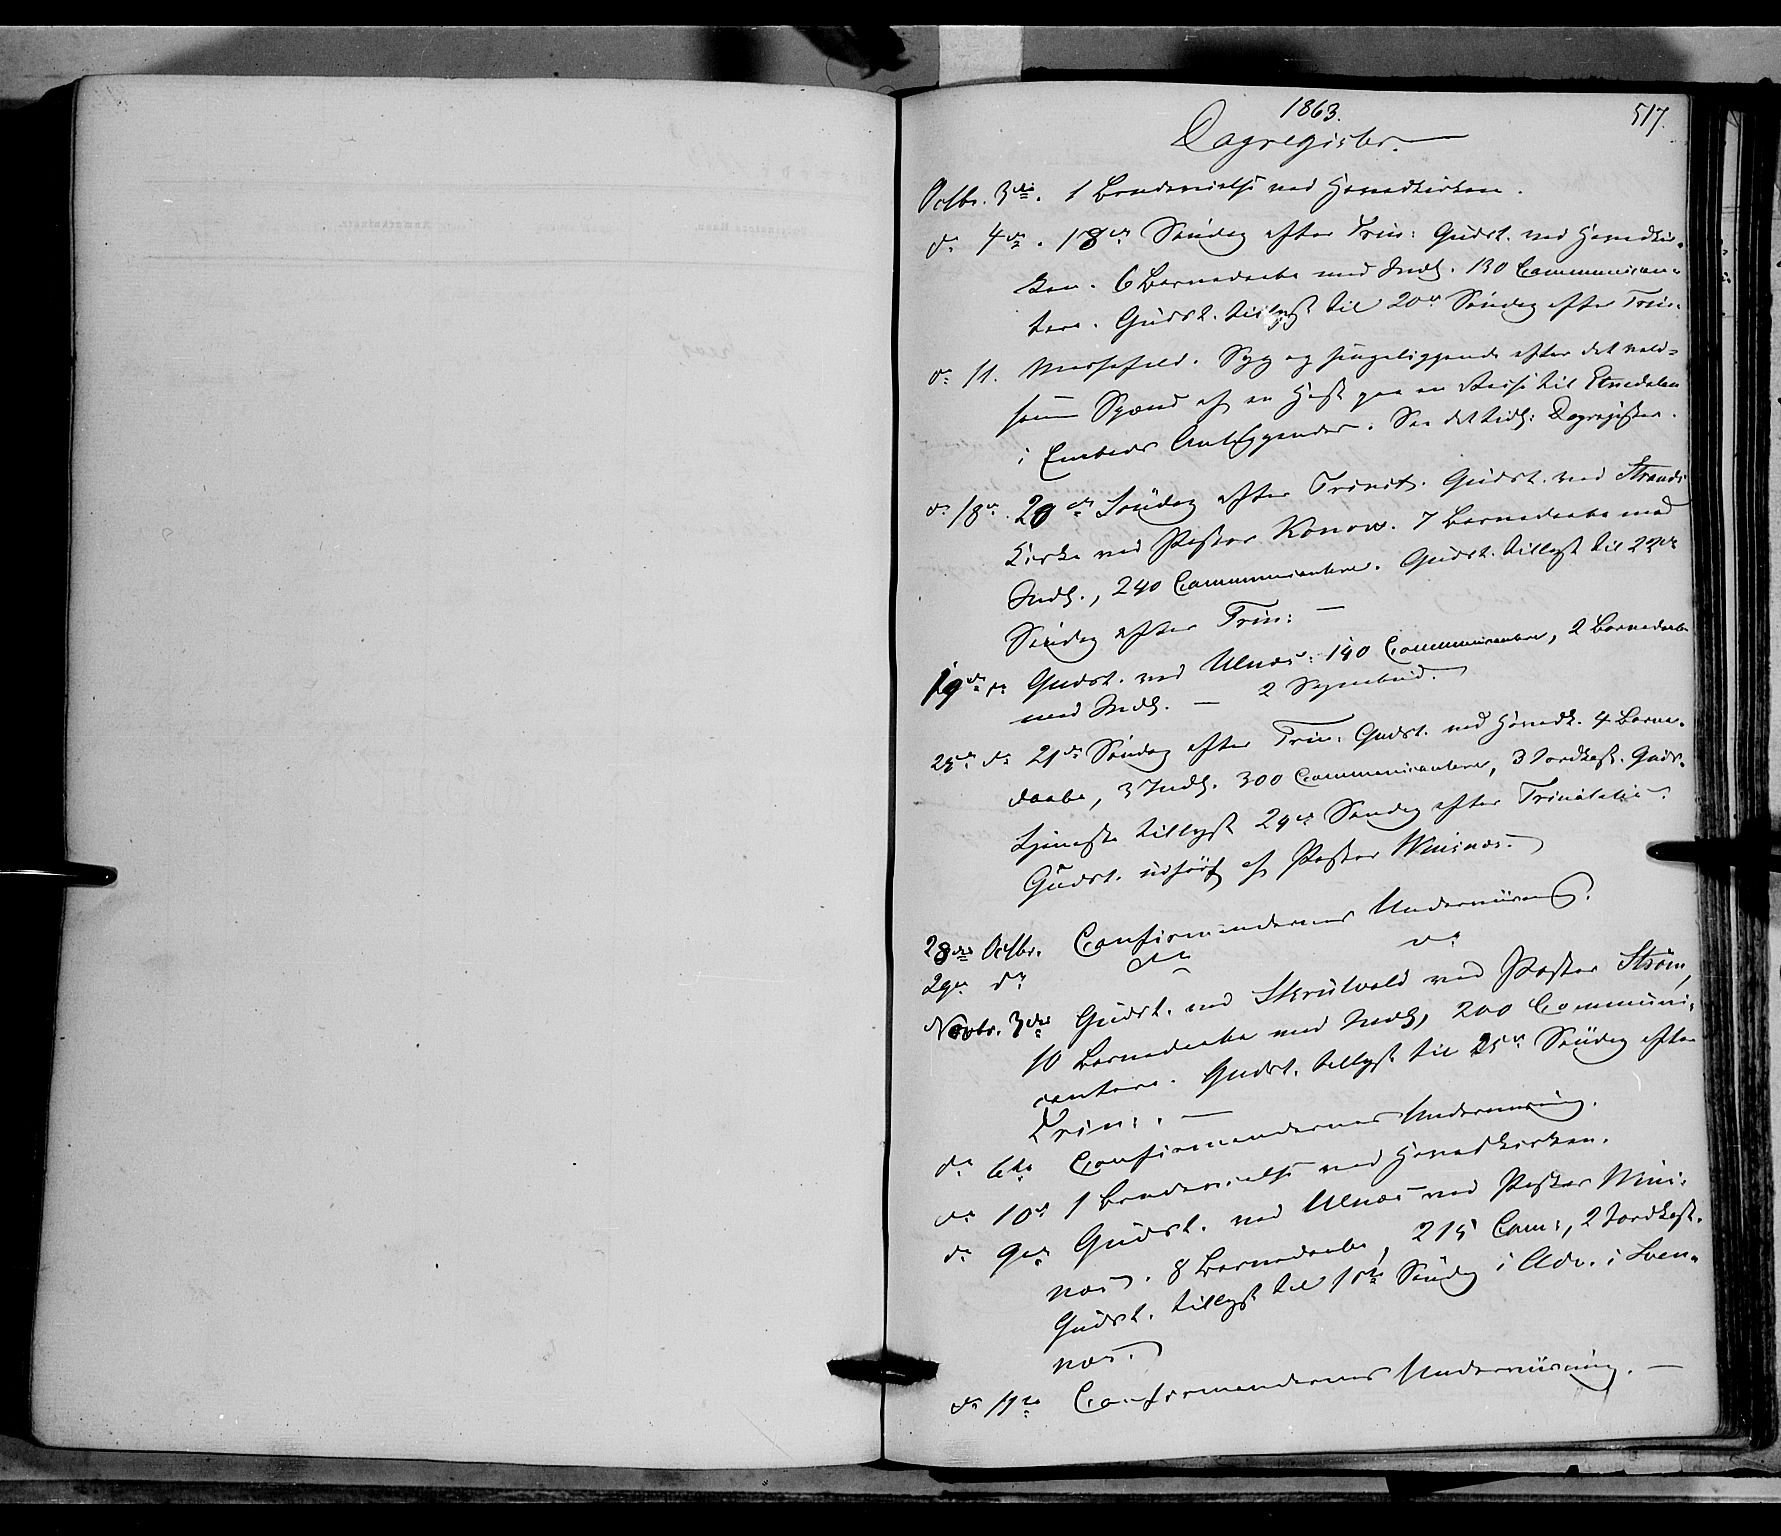 SAH, Nord-Aurdal prestekontor, Ministerialbok nr. 8, 1863-1875, s. 517